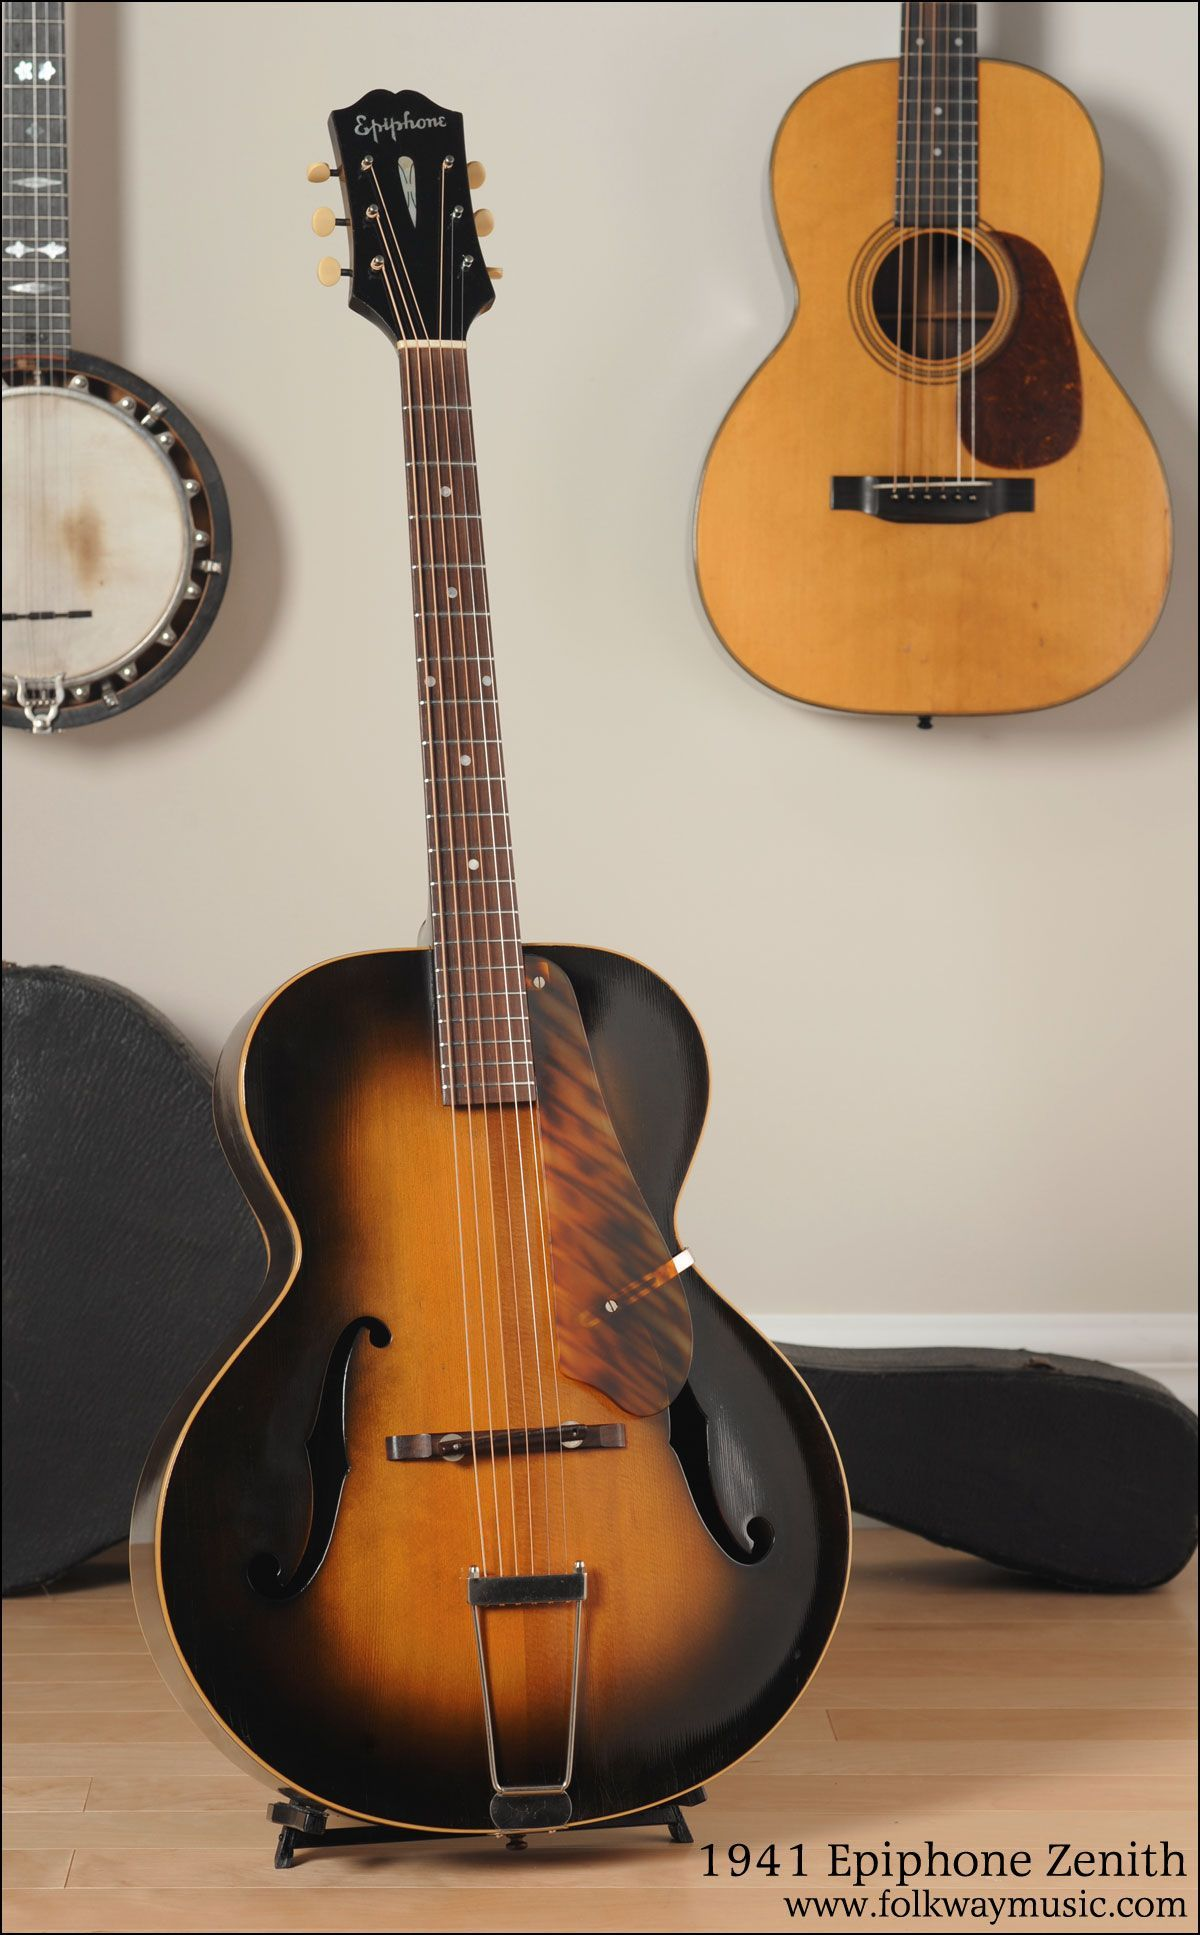 1941 Epiphone Zenith Epiphone Cool Electric Guitars Guitar